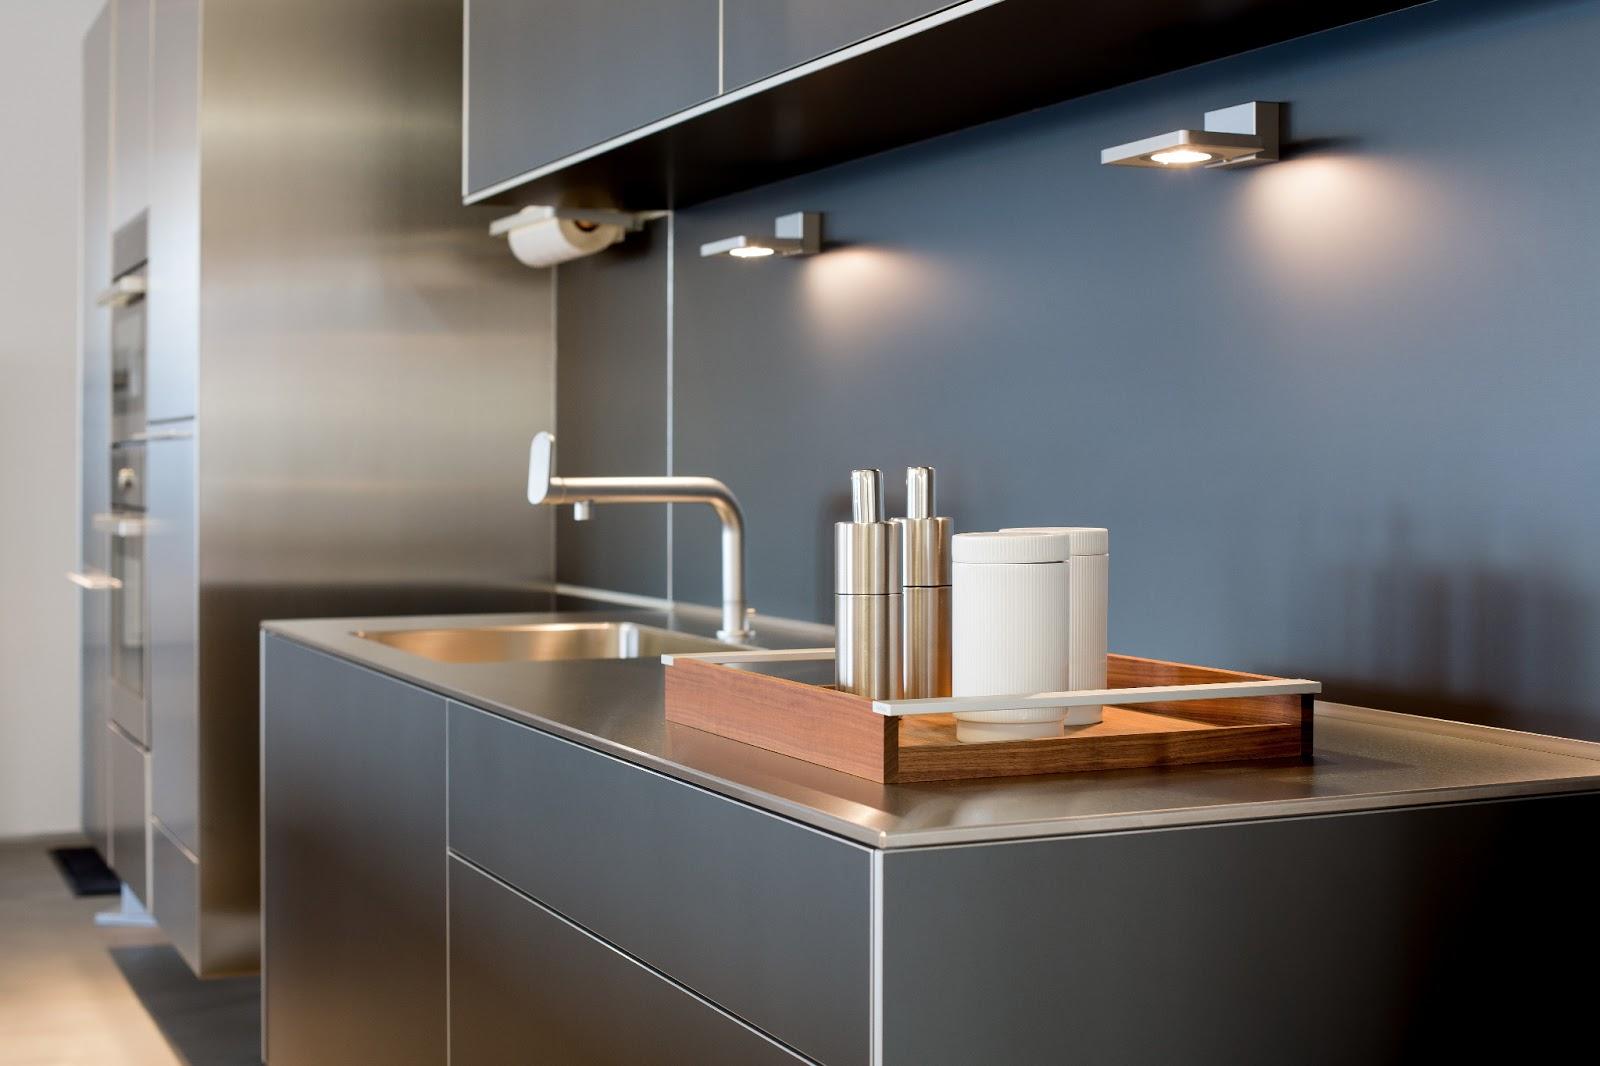 jess Bulthaup kitchen